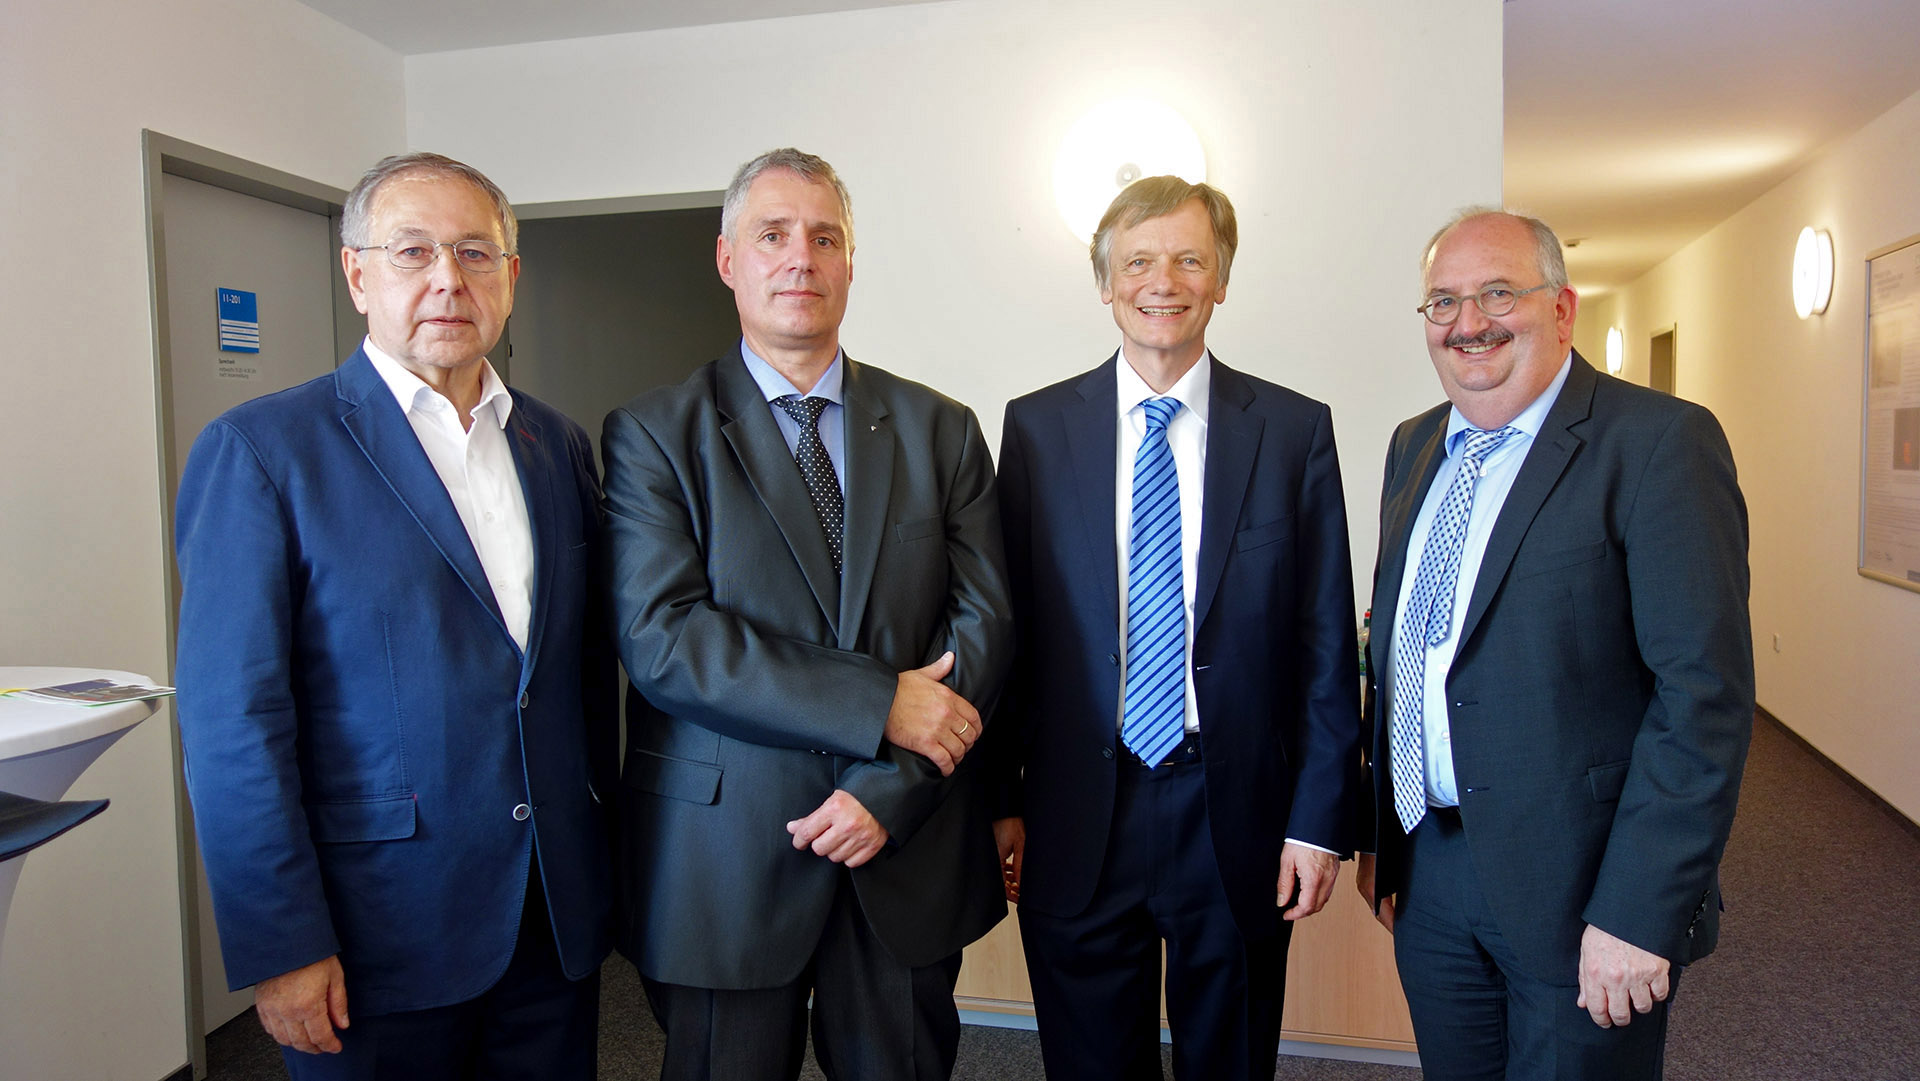 v.l.n.r. Prof. Gerhard Thiem (Zweitbetreuer), Prof. Bert Schusser, Prof. Thorsten Posselt (Doktorvater), Prof. Ludwig Hilmer